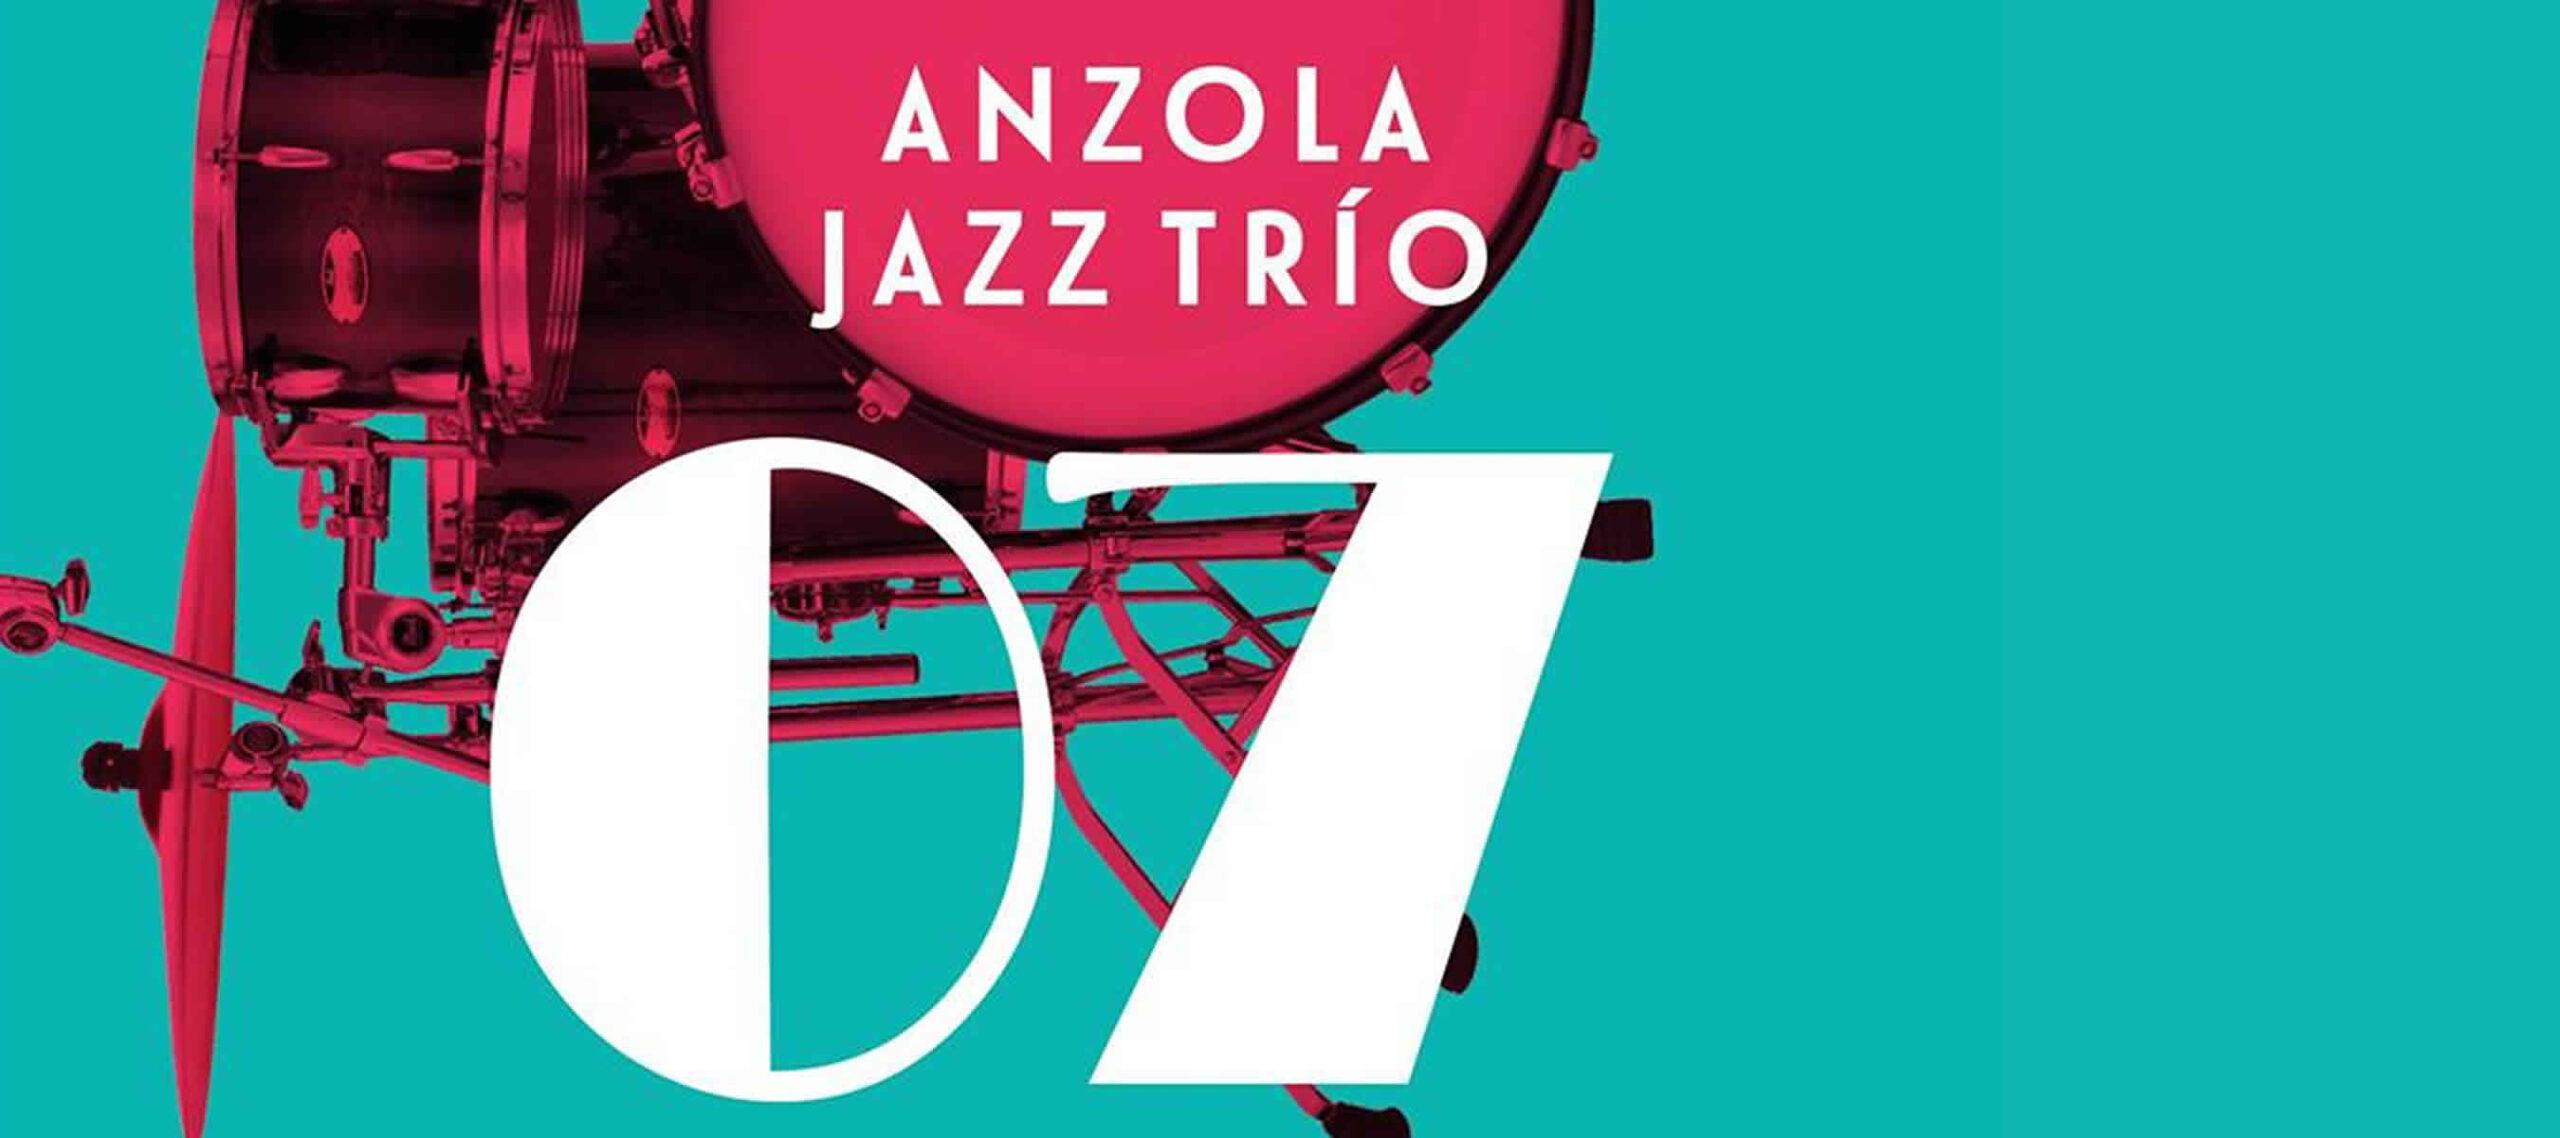 Anzola Jazz Trio en Smoking Molly